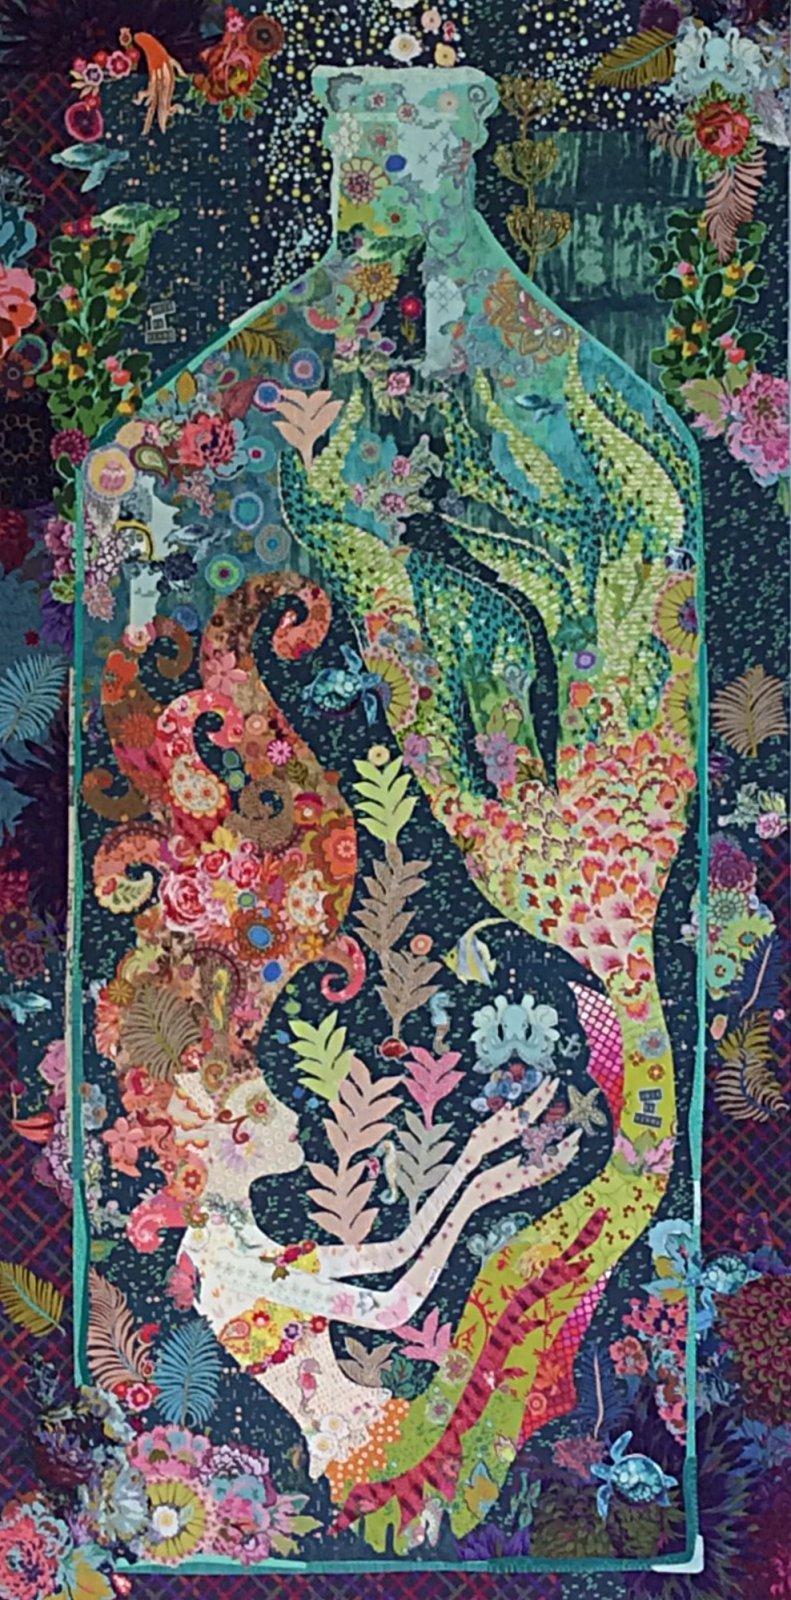 Line Art Quilt Kit : Collage kits by laura heine